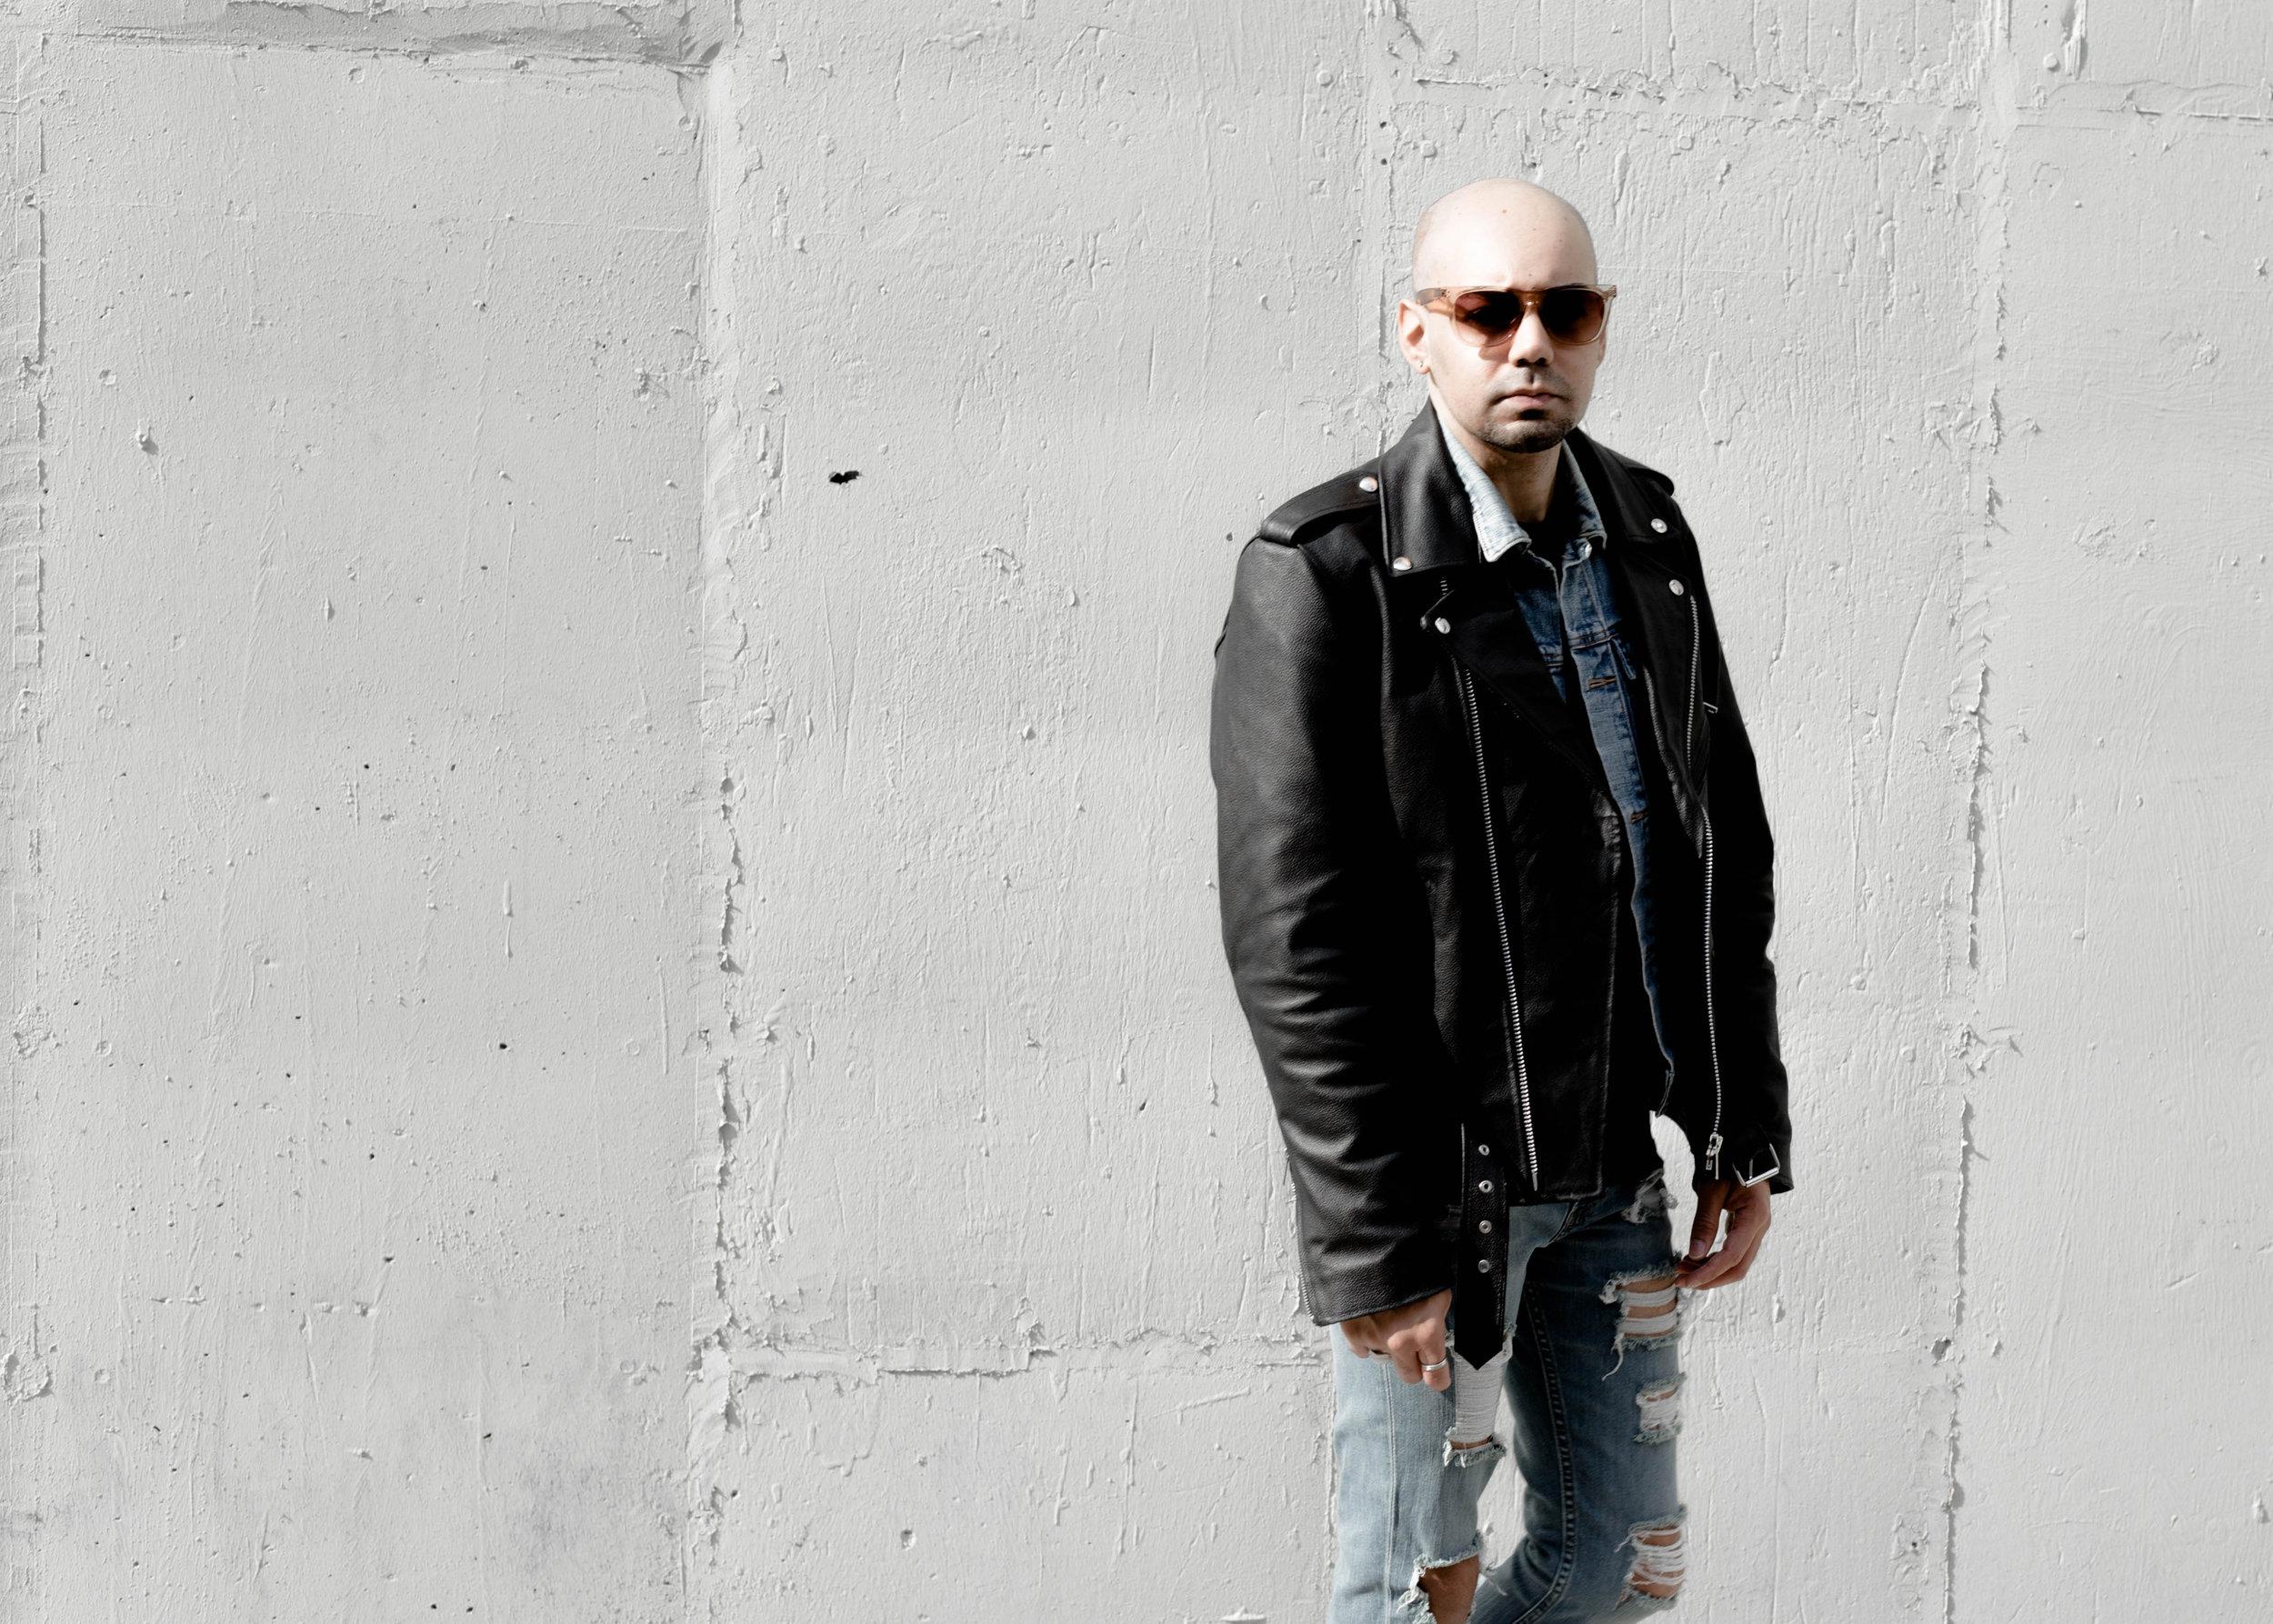 sam-c-perry-leather-jacket-denim-on-distressed-denim-cropped.jpg